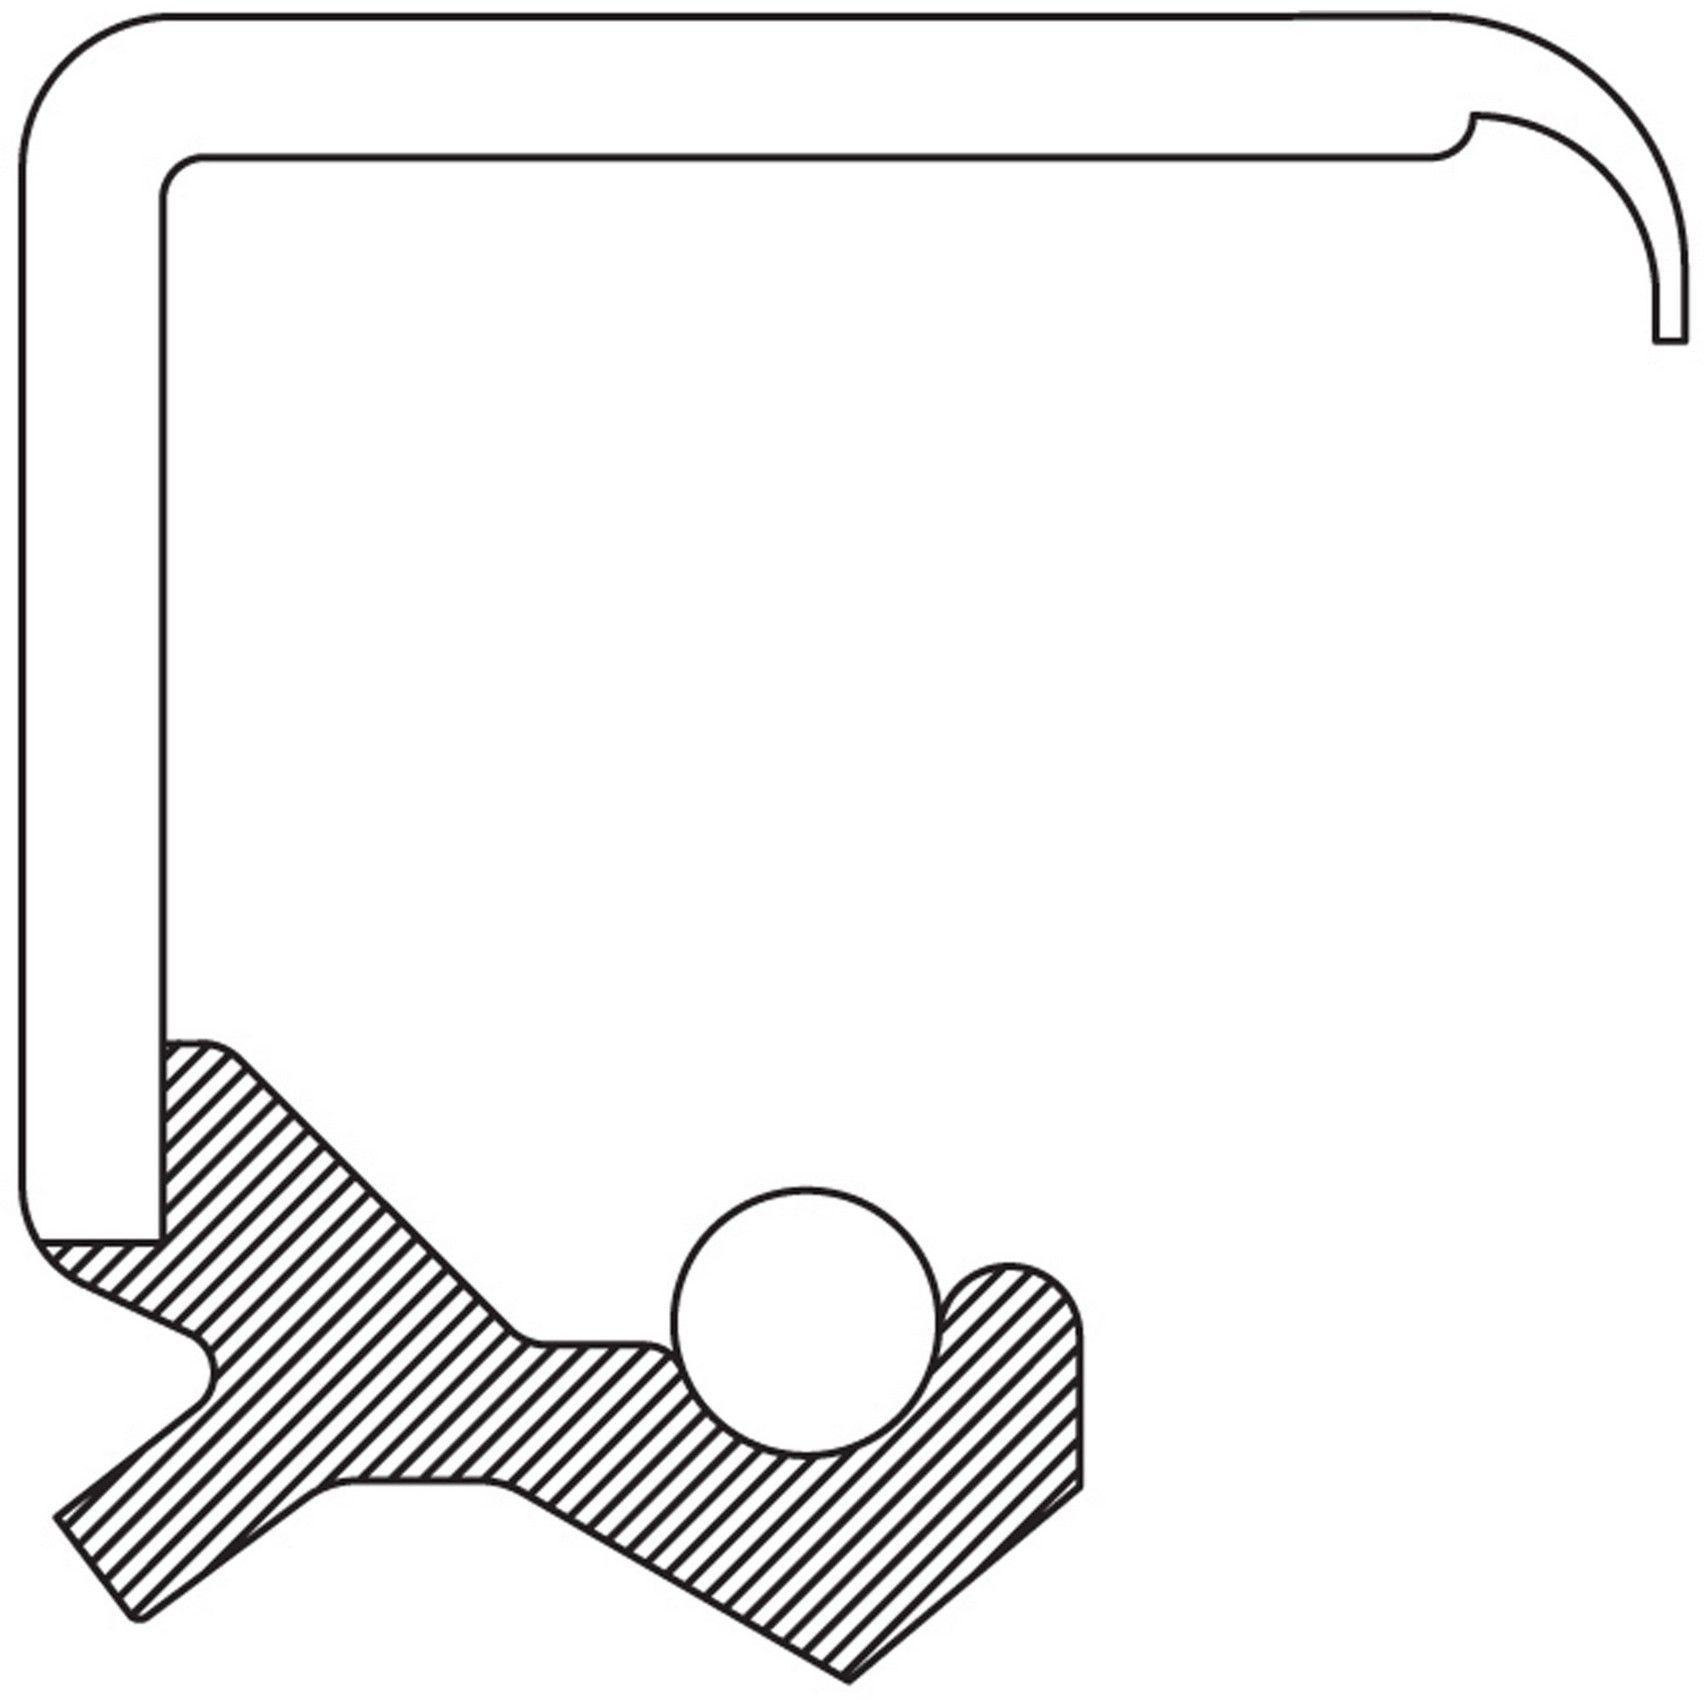 2004 f150 transfer case seal